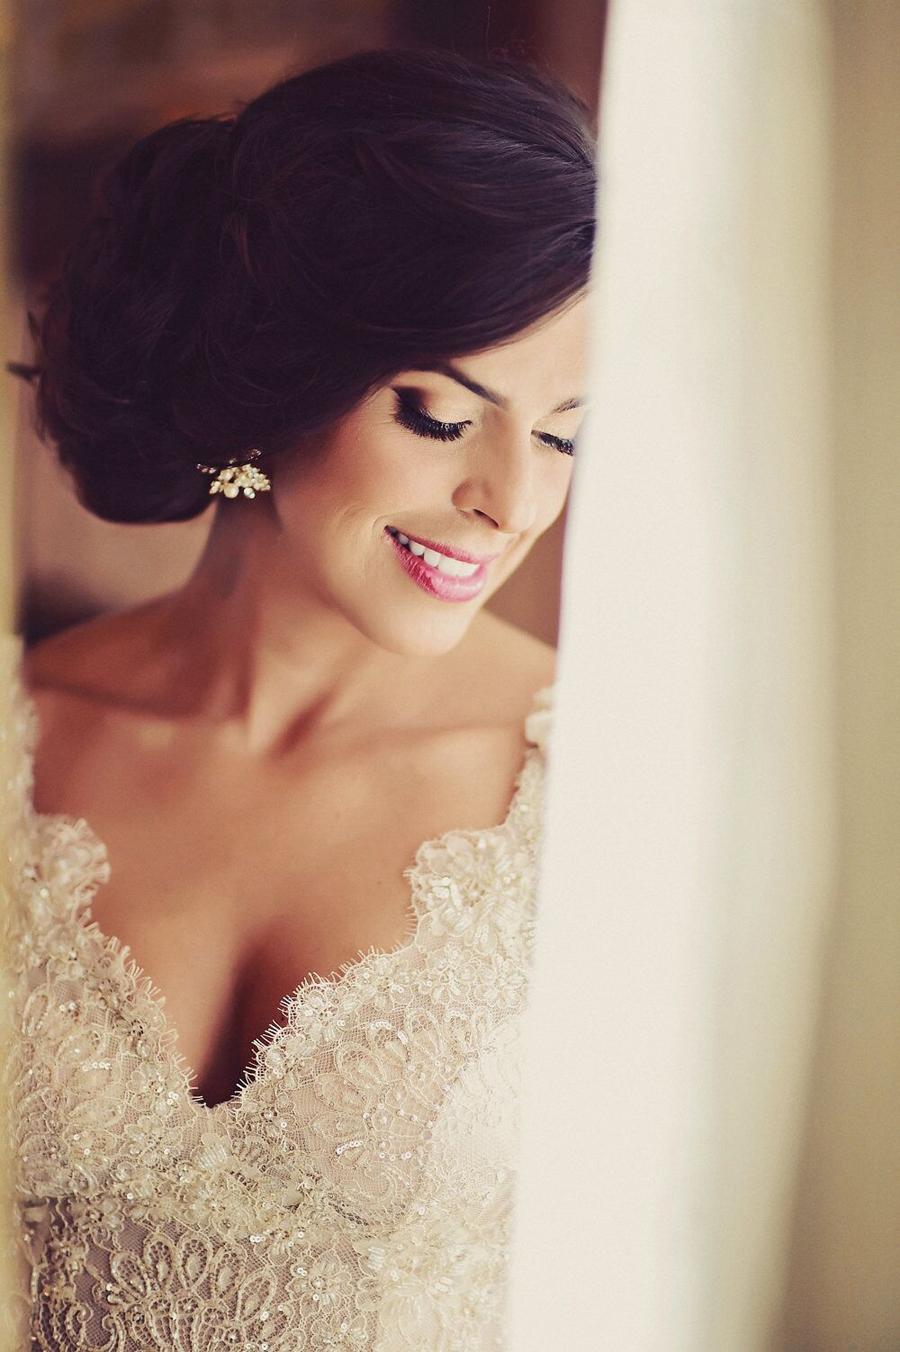 Bride, Bridal Style, Beauty